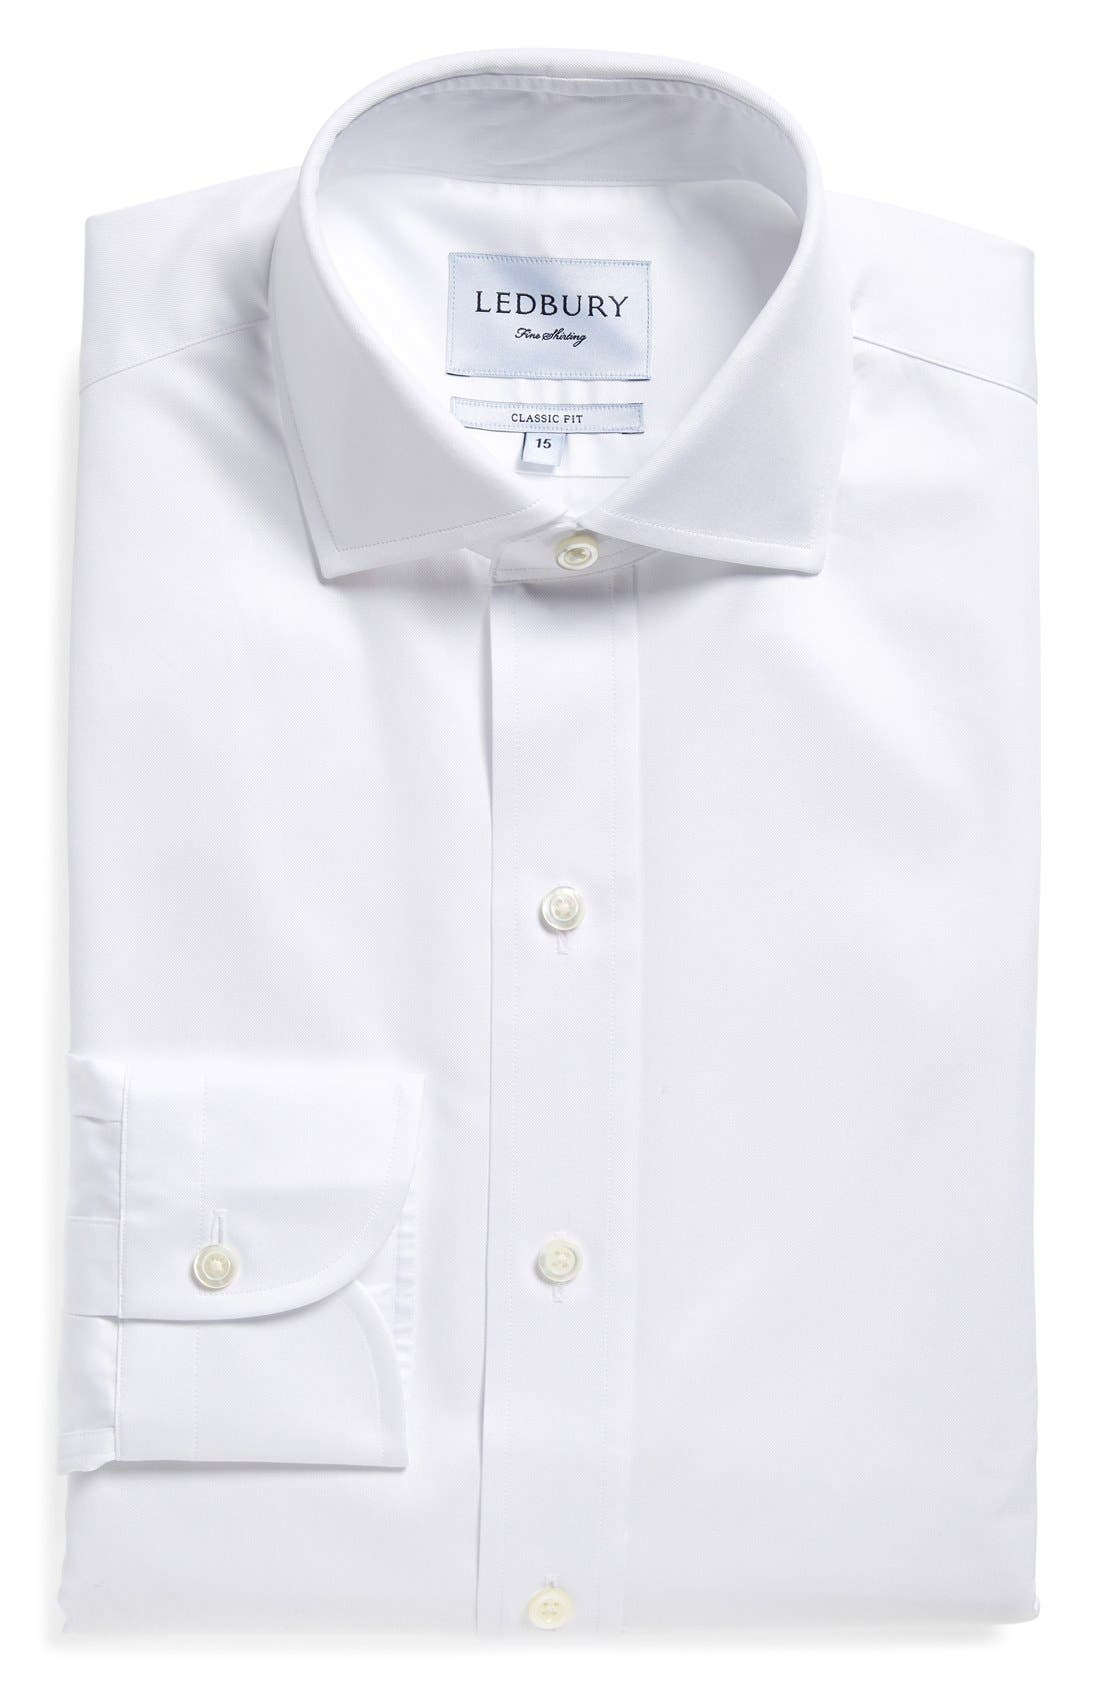 LEDBURY Classic Fit Fine Twill Dress Shirt in White